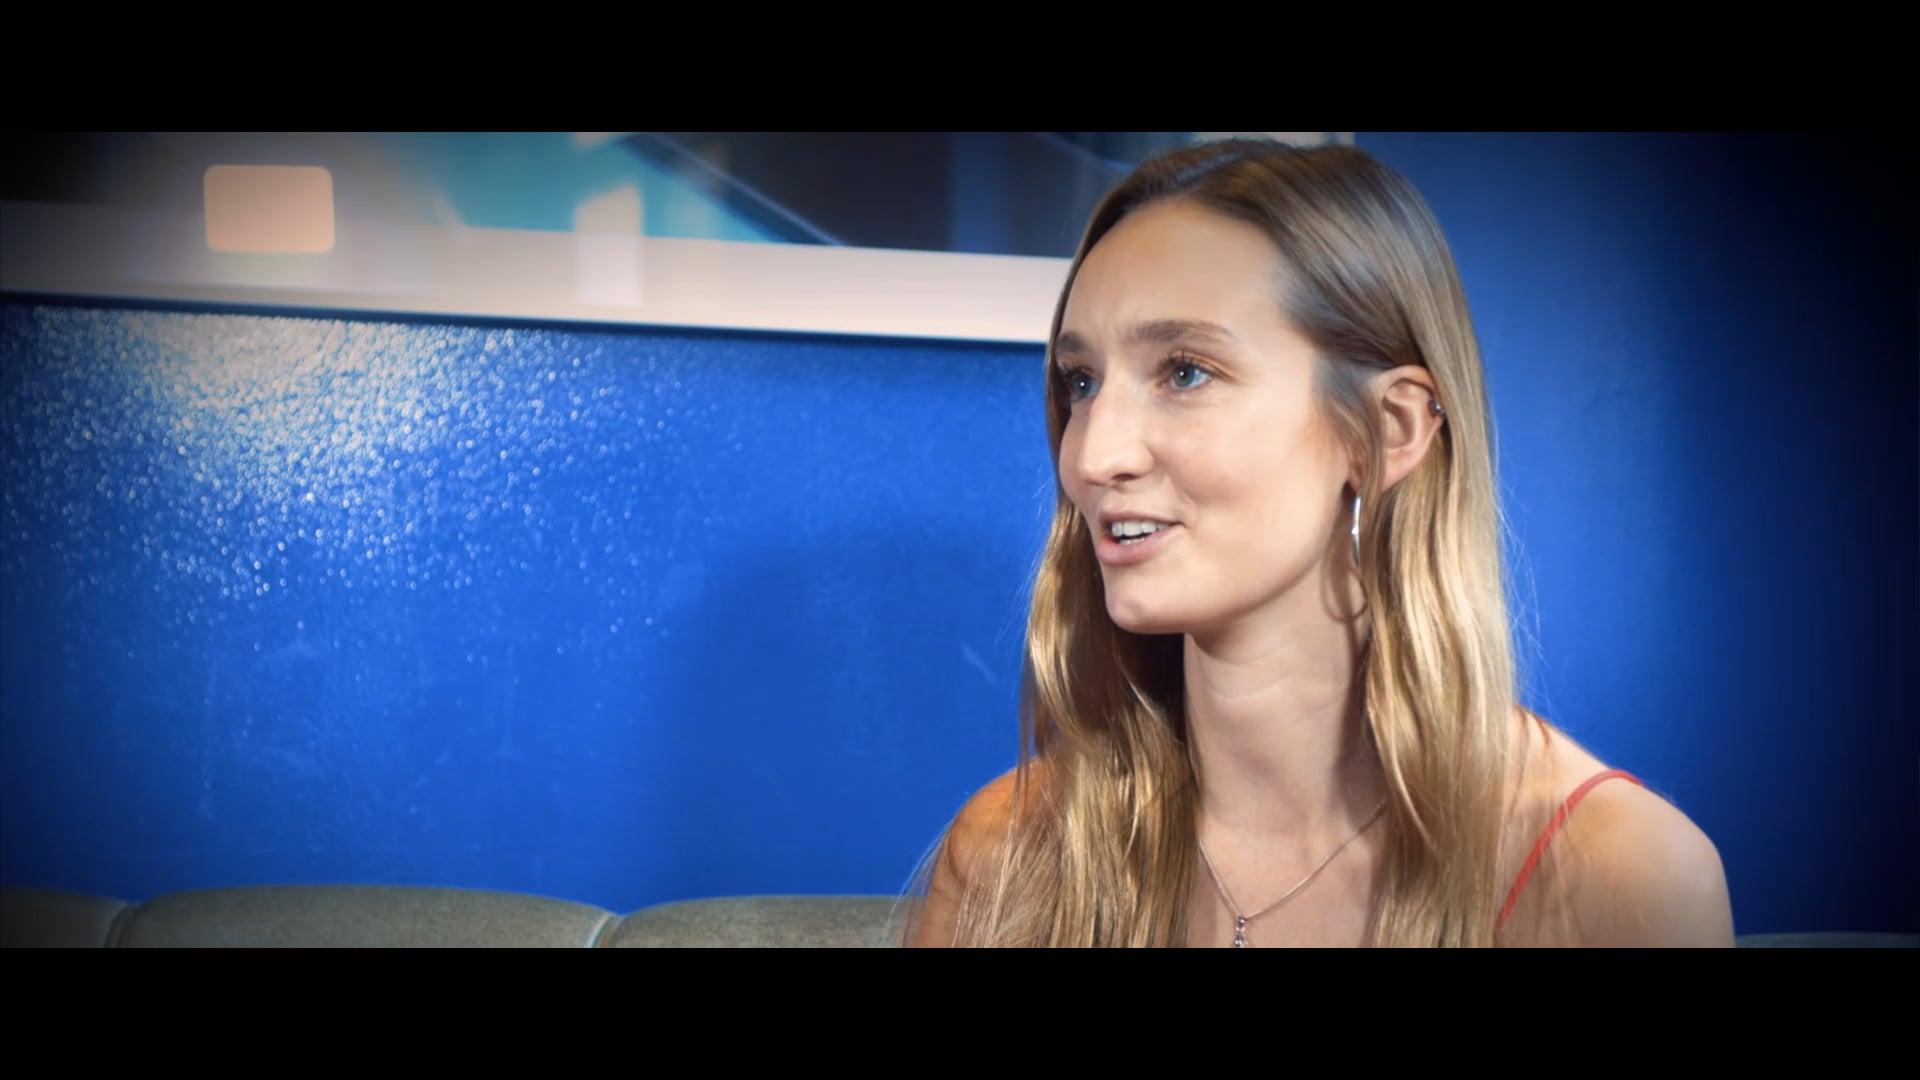 Sarah Lott - Actor